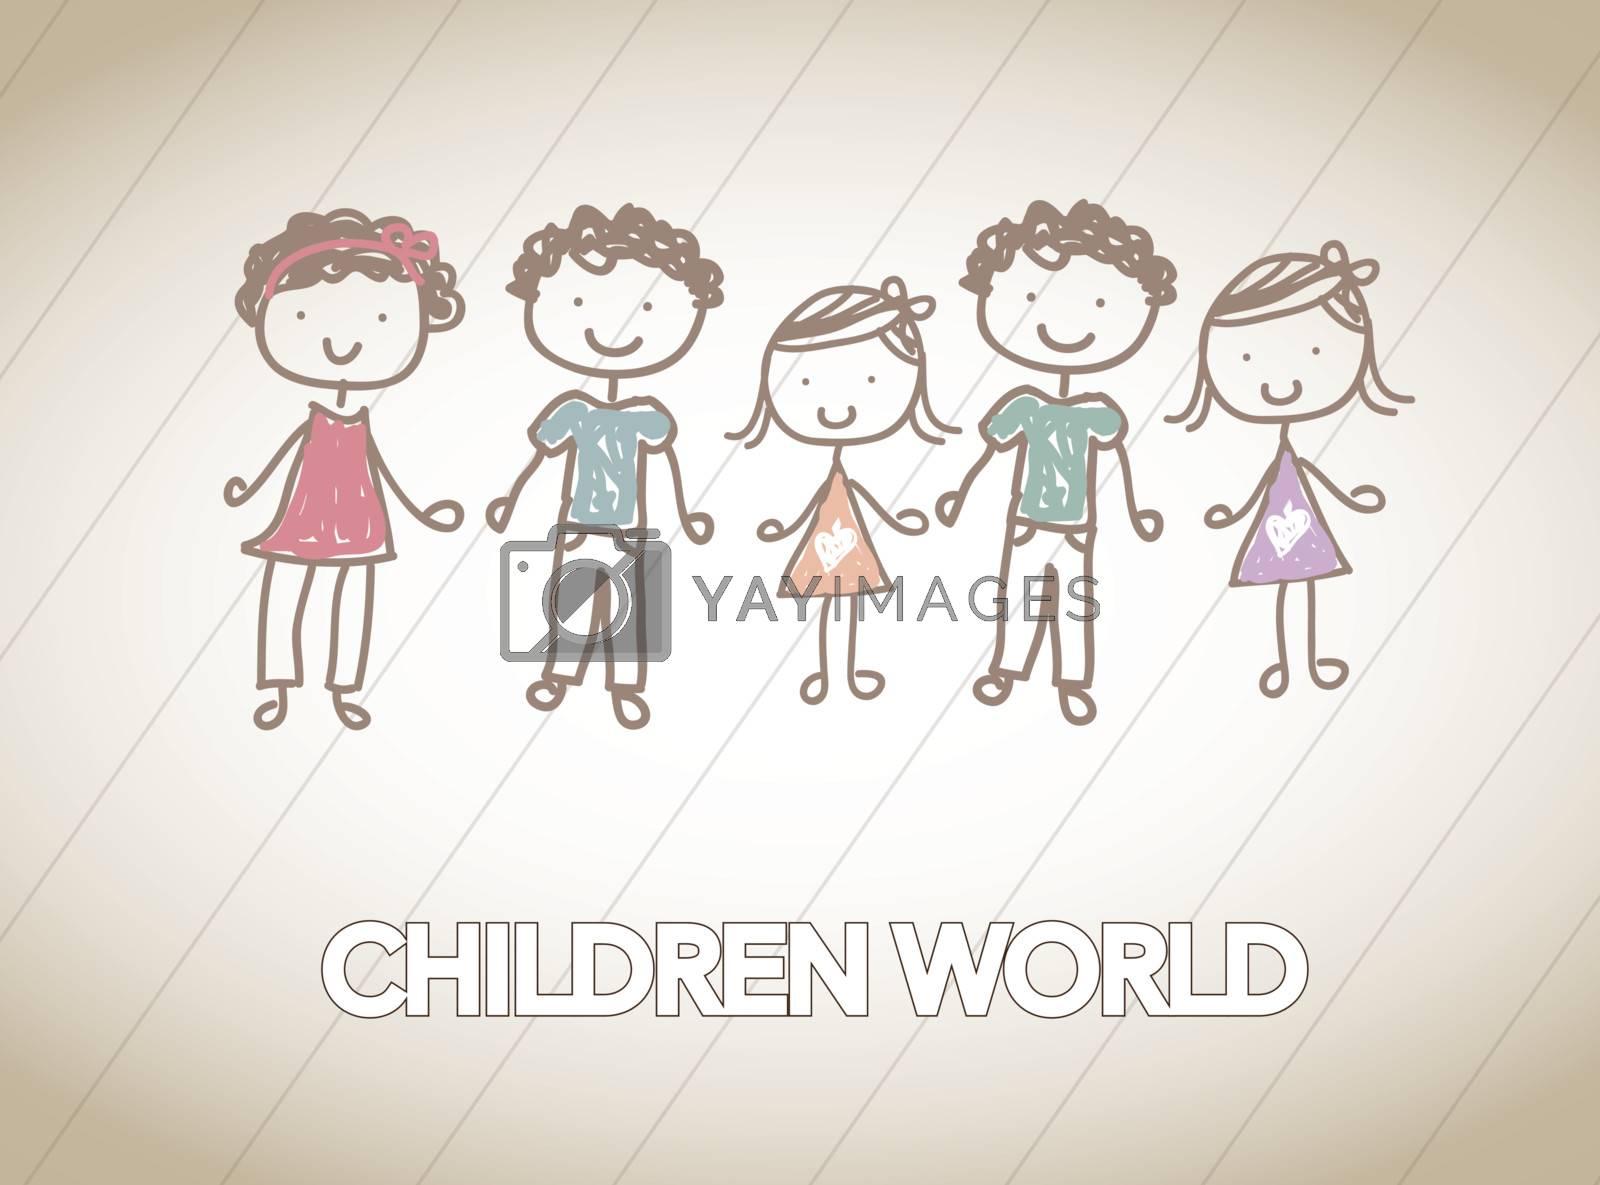 children together in friendship over white background